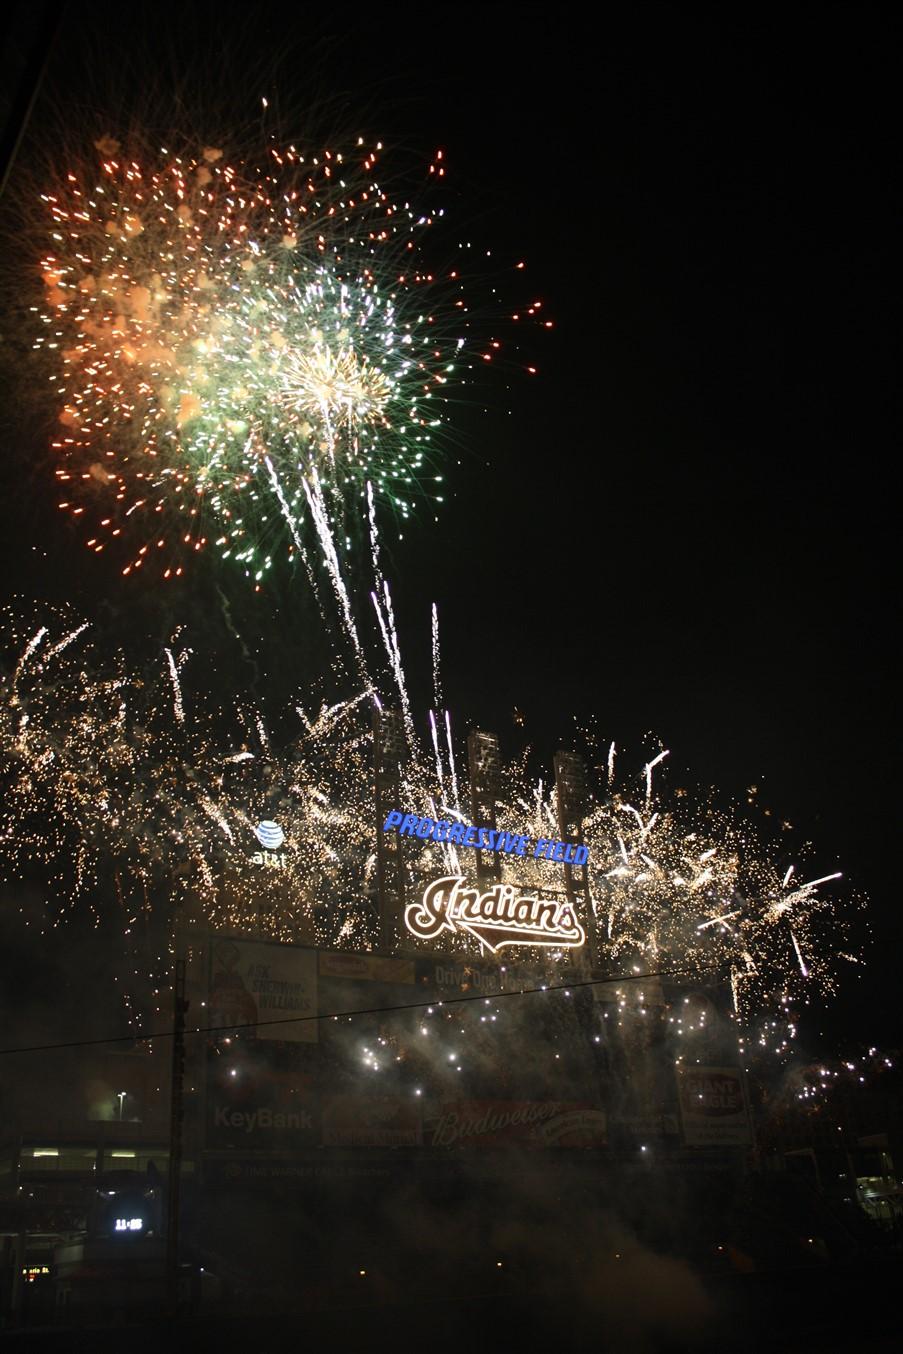 2009 06 15 Cleveland Indians 49.jpg